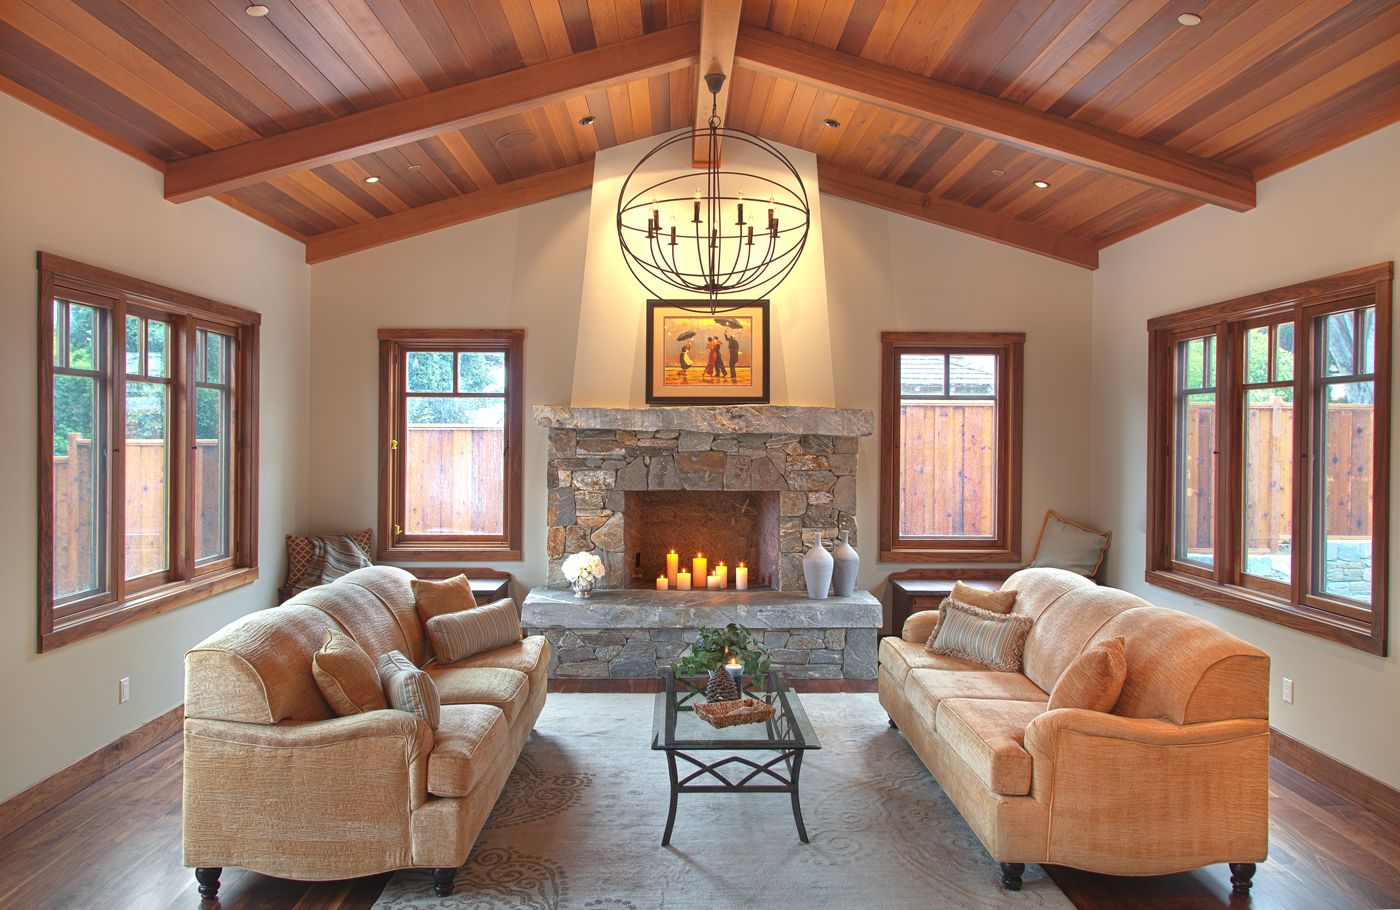 Lodge Bedroom Furniture Red Cedar Bedroom Furniture Cabin Ranch Lodge Furniture Bedroom